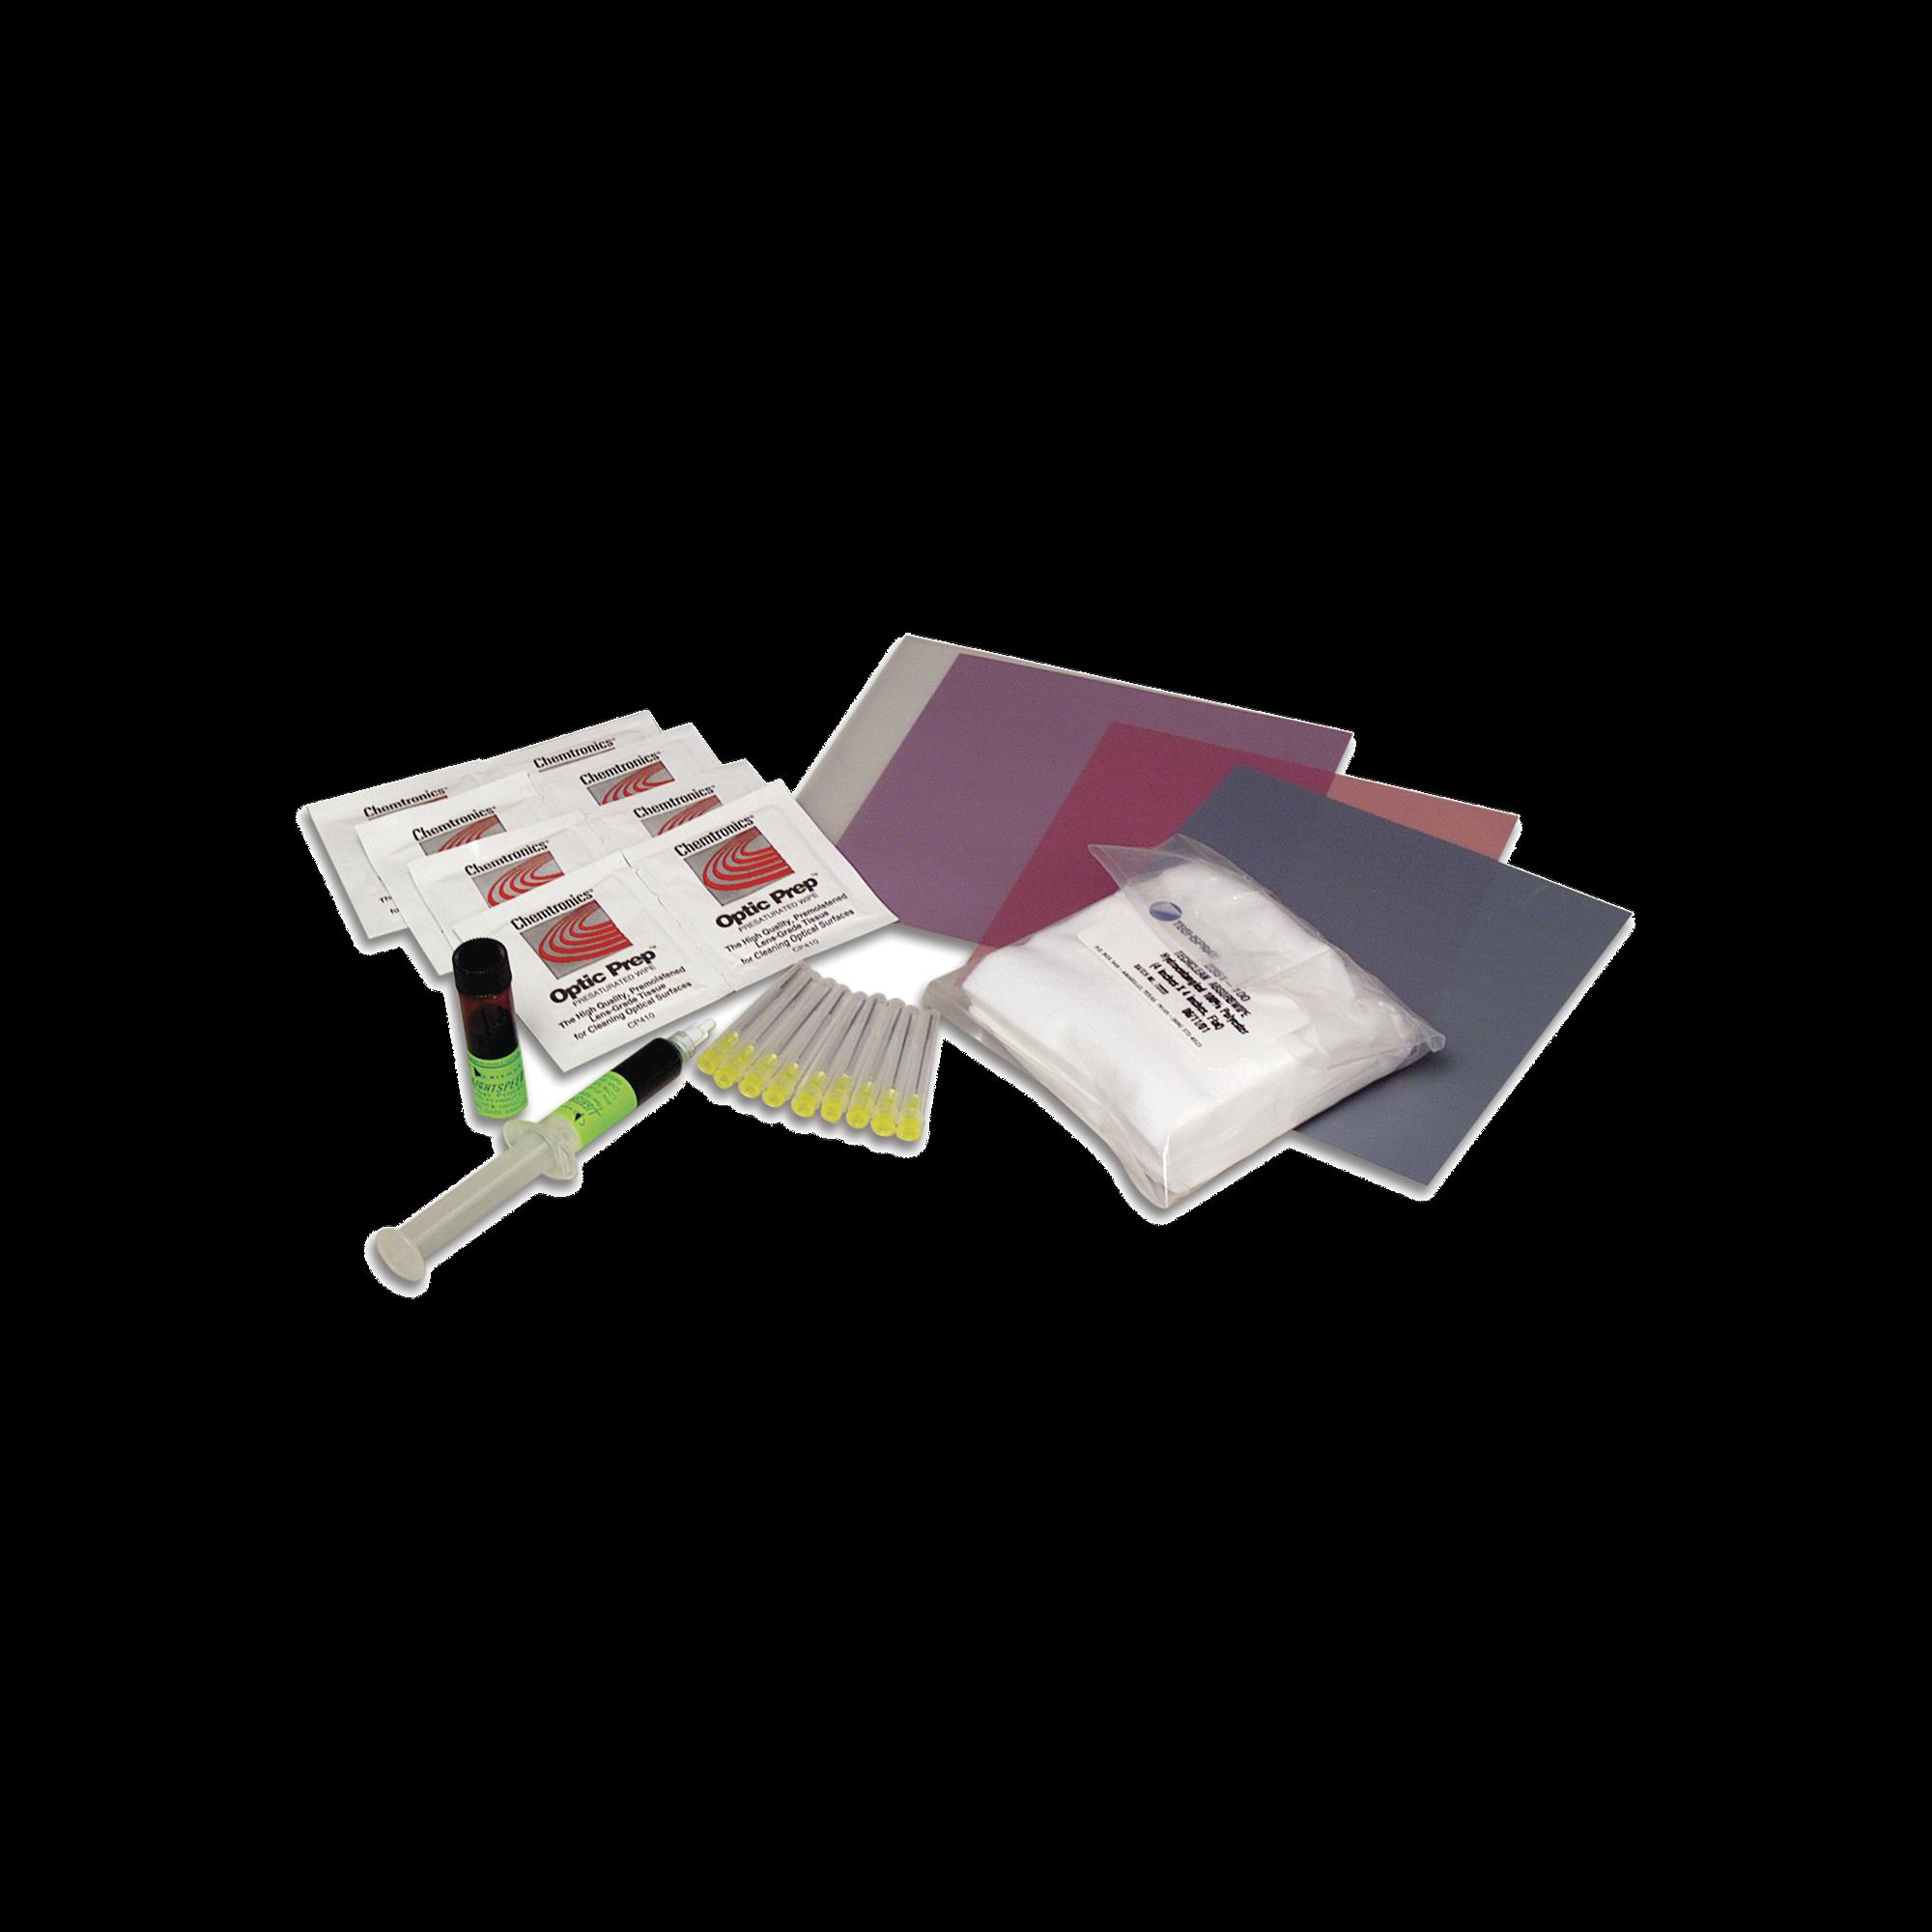 Kit de Consumibles Para Conectores de Fibra óptica, Uso con Kit FTERM-L2, Para 200 Conectores Monomodo o Multimodo